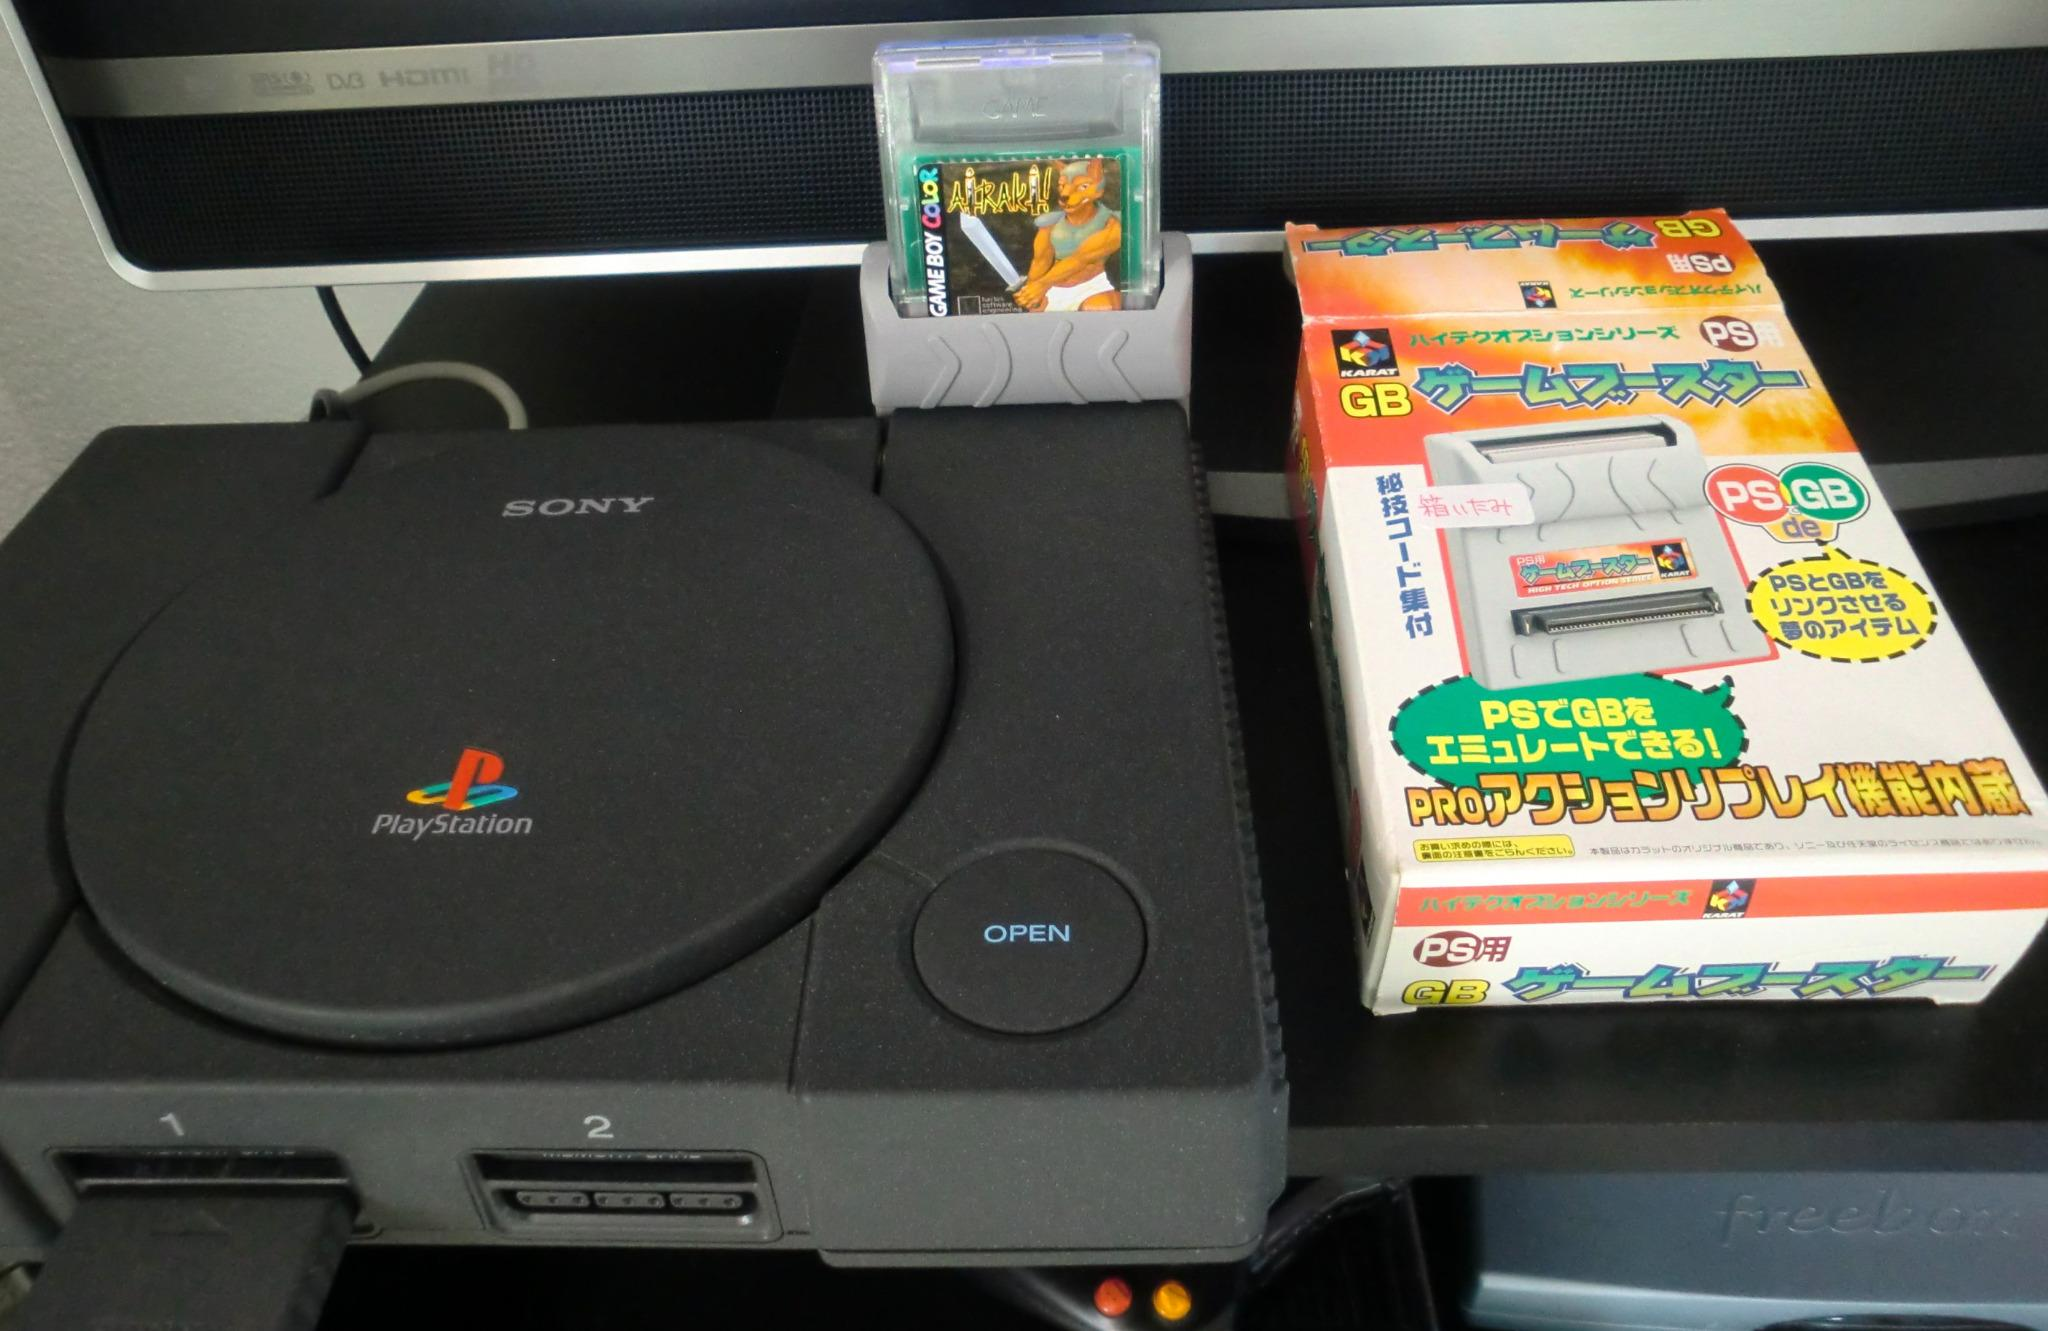 Super Gameboy Like For Ps1 Playstation Development Network